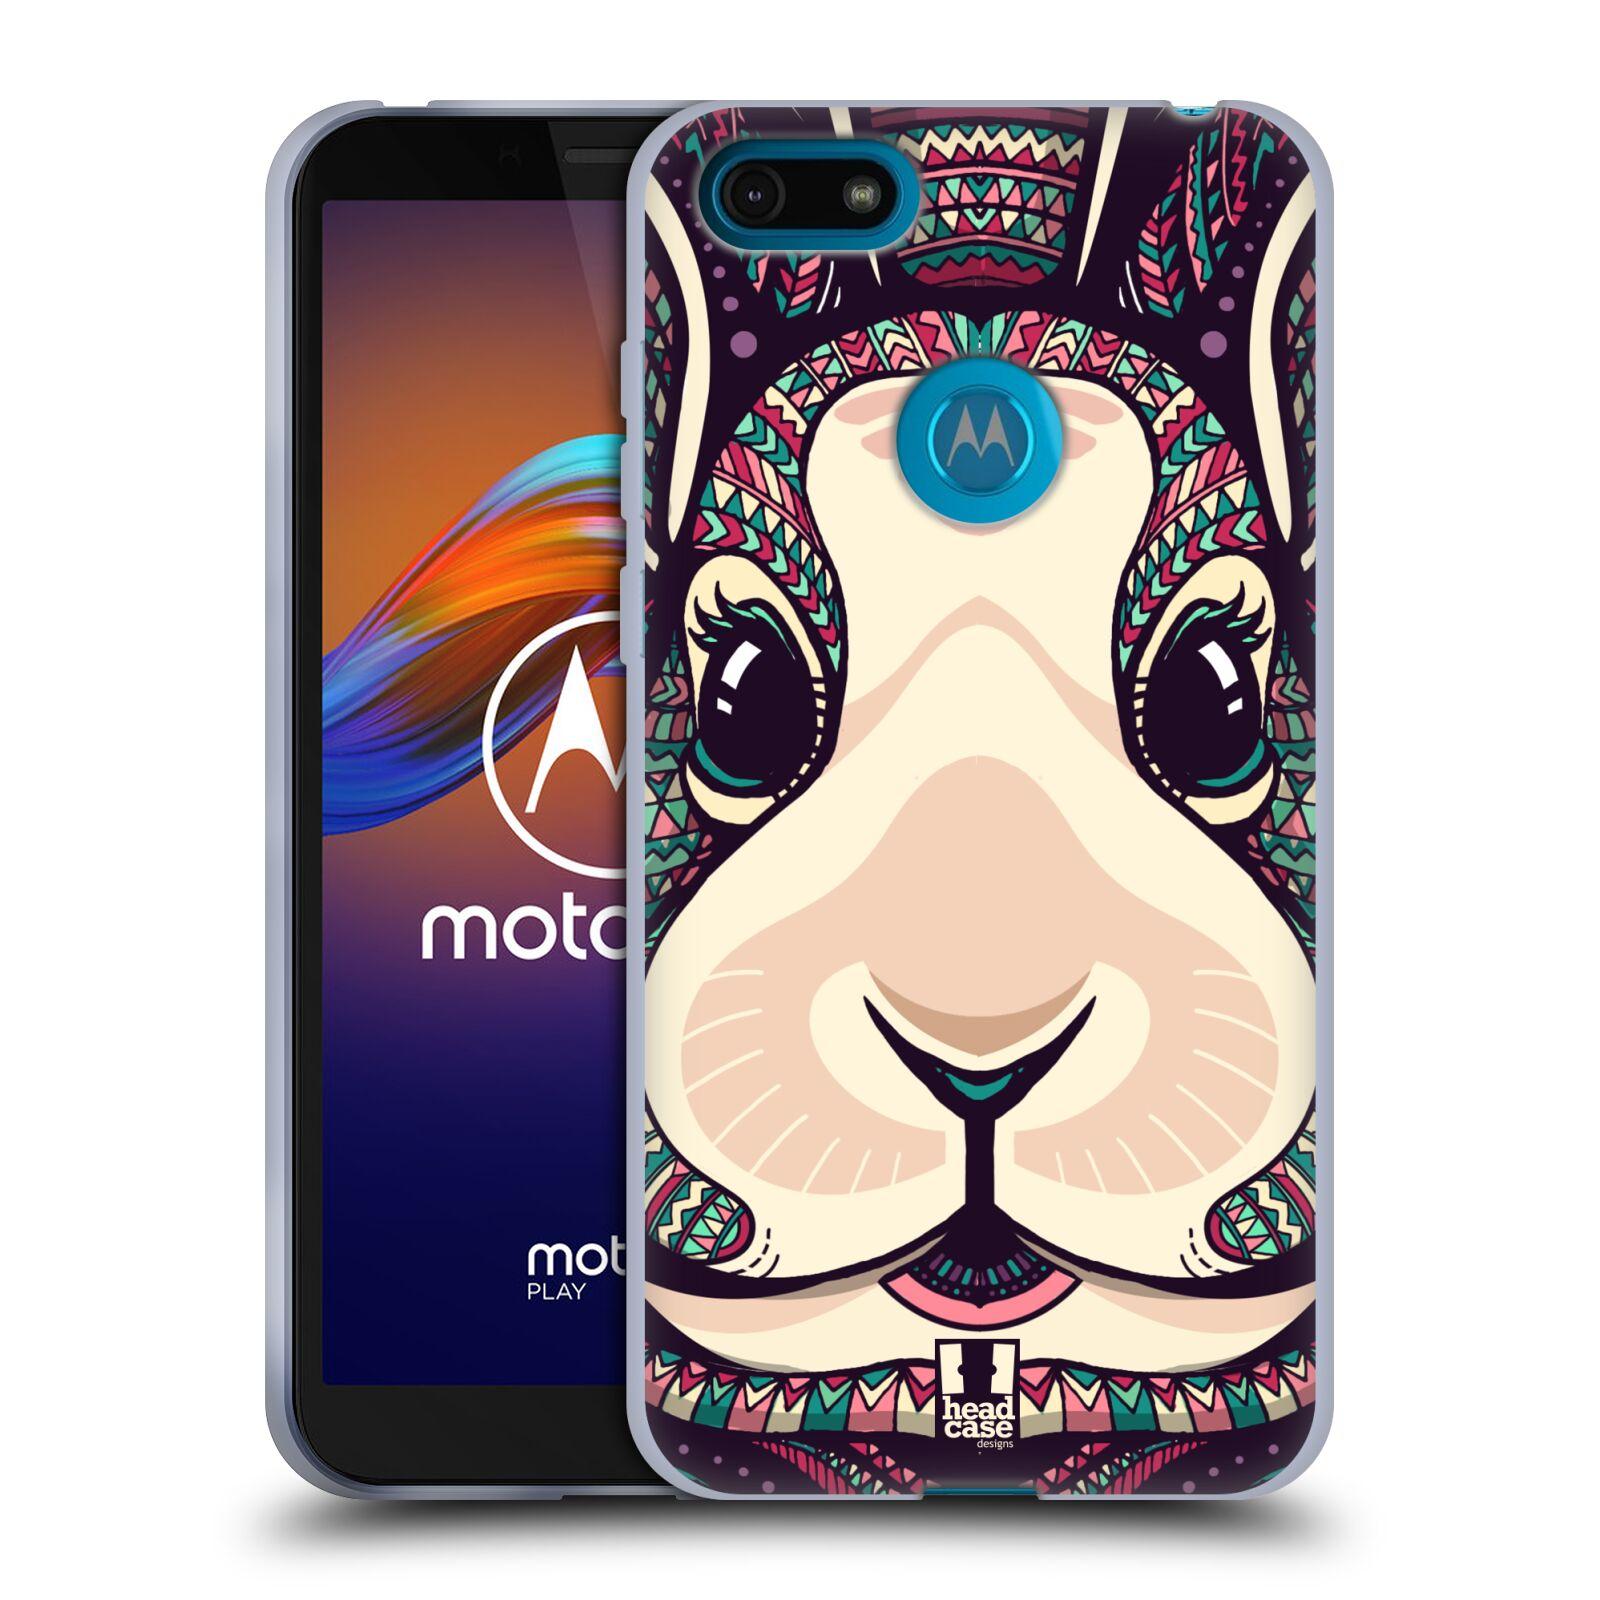 Silikonové pouzdro na mobil Motorola Moto E6 Play - Head Case - AZTEC ZAJÍČEK